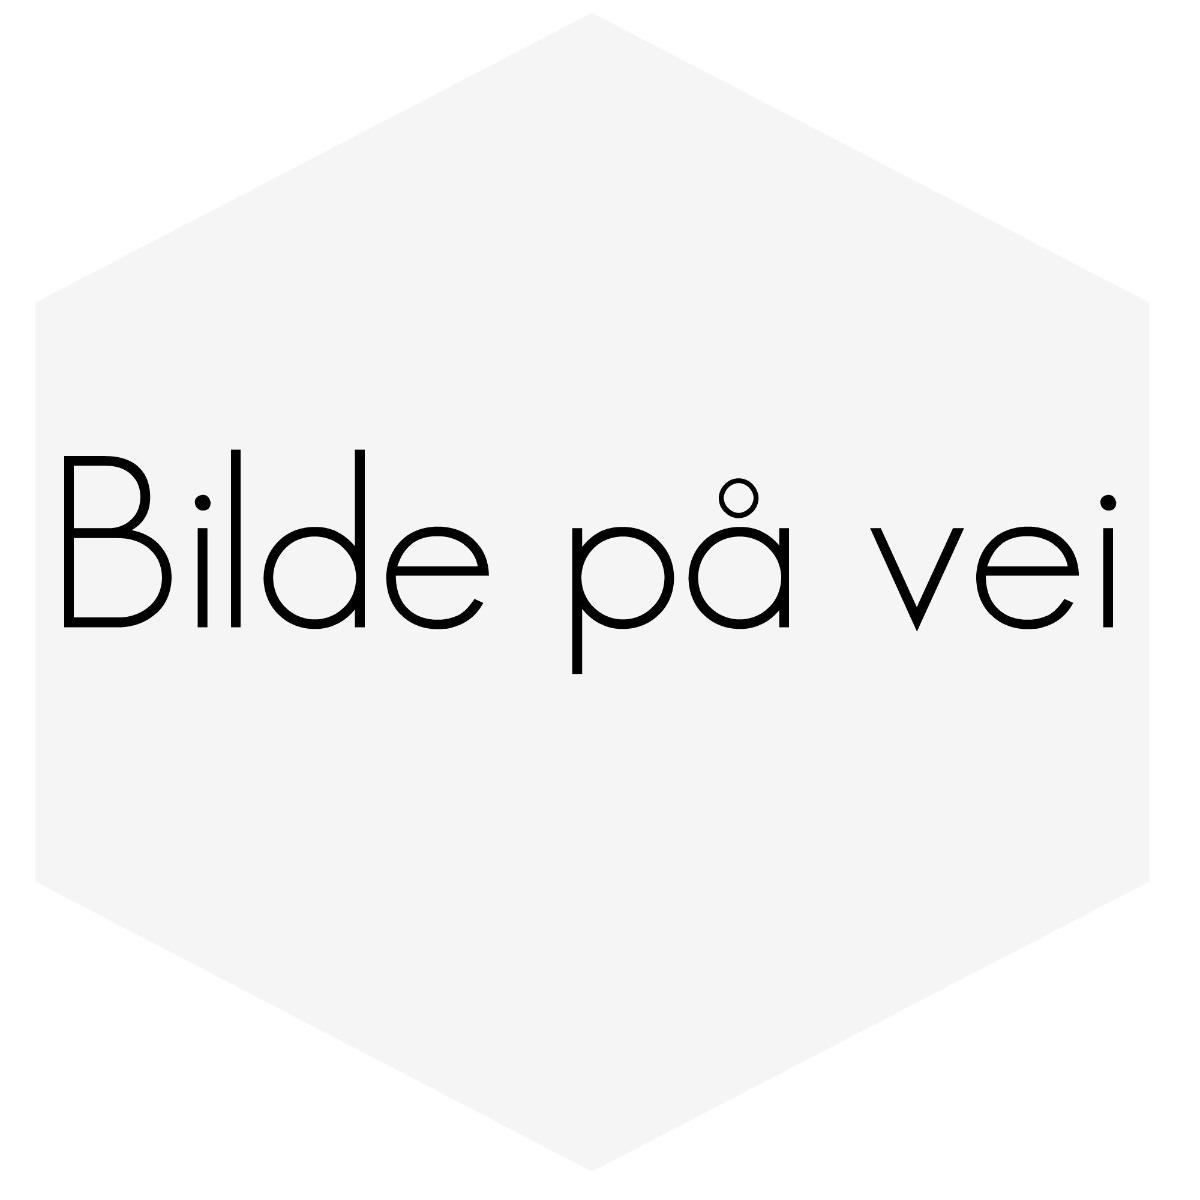 HÅNDBREKK SKO 140/160>71 P1800-70-72 3516112